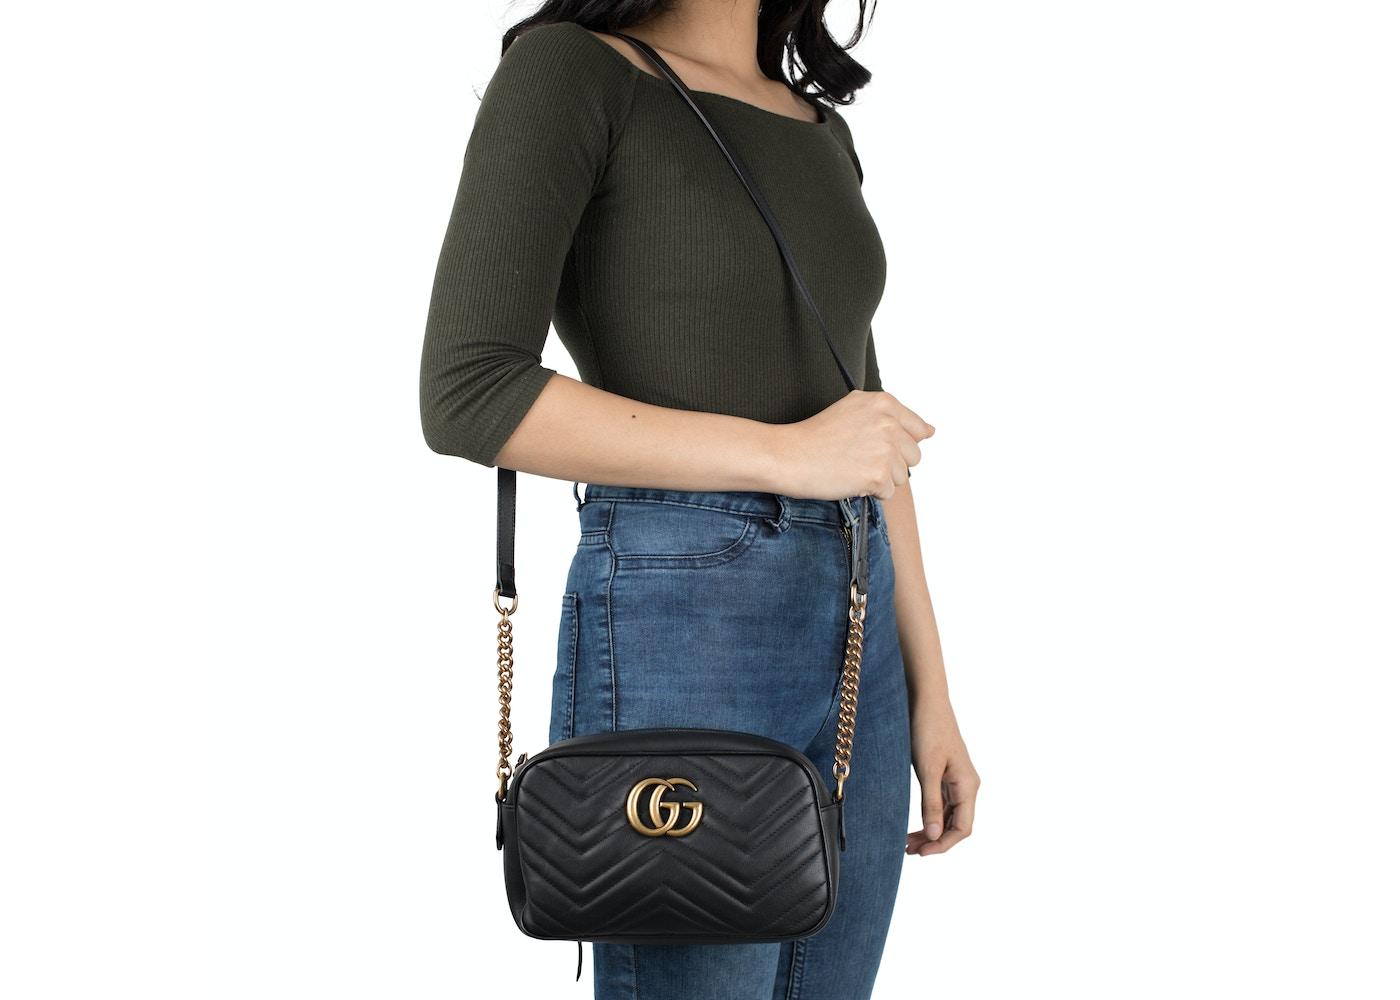 Gucci GG Marmont Matelasse Small Shoulder Bag (Varied